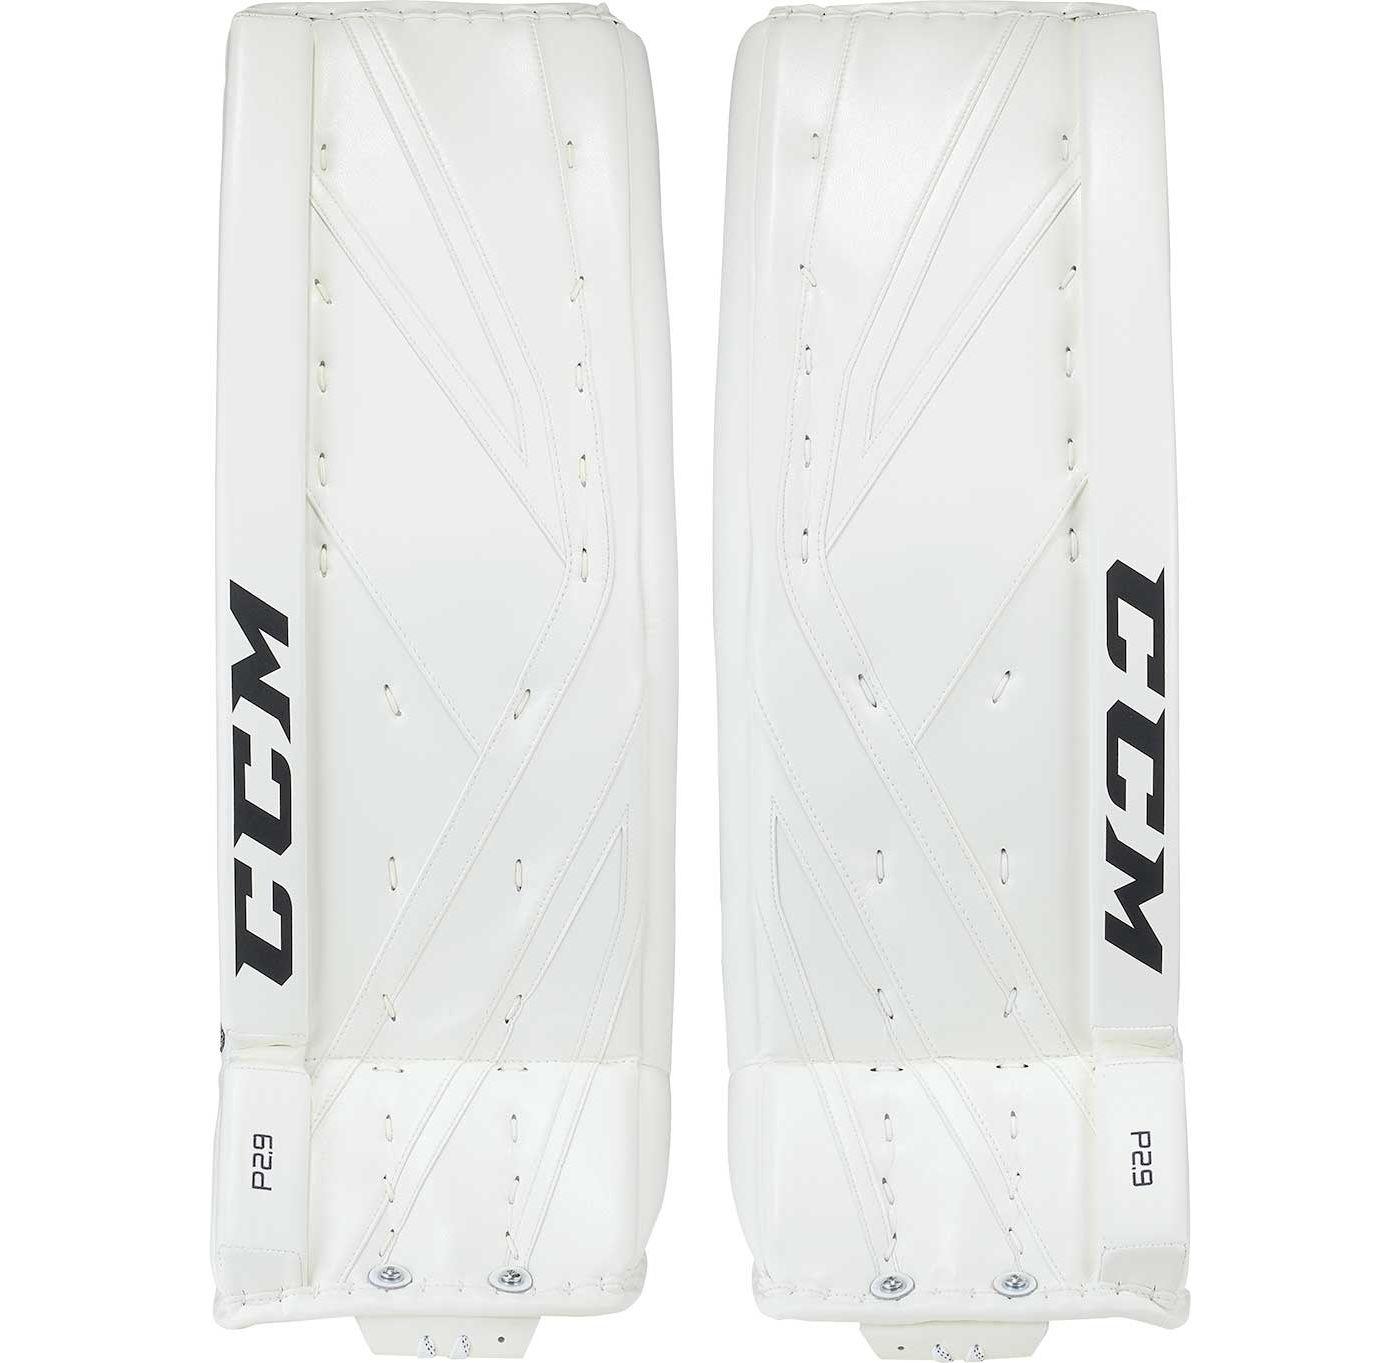 CCM Senior Premier P2.9 Ice Hockey Goalie Pads